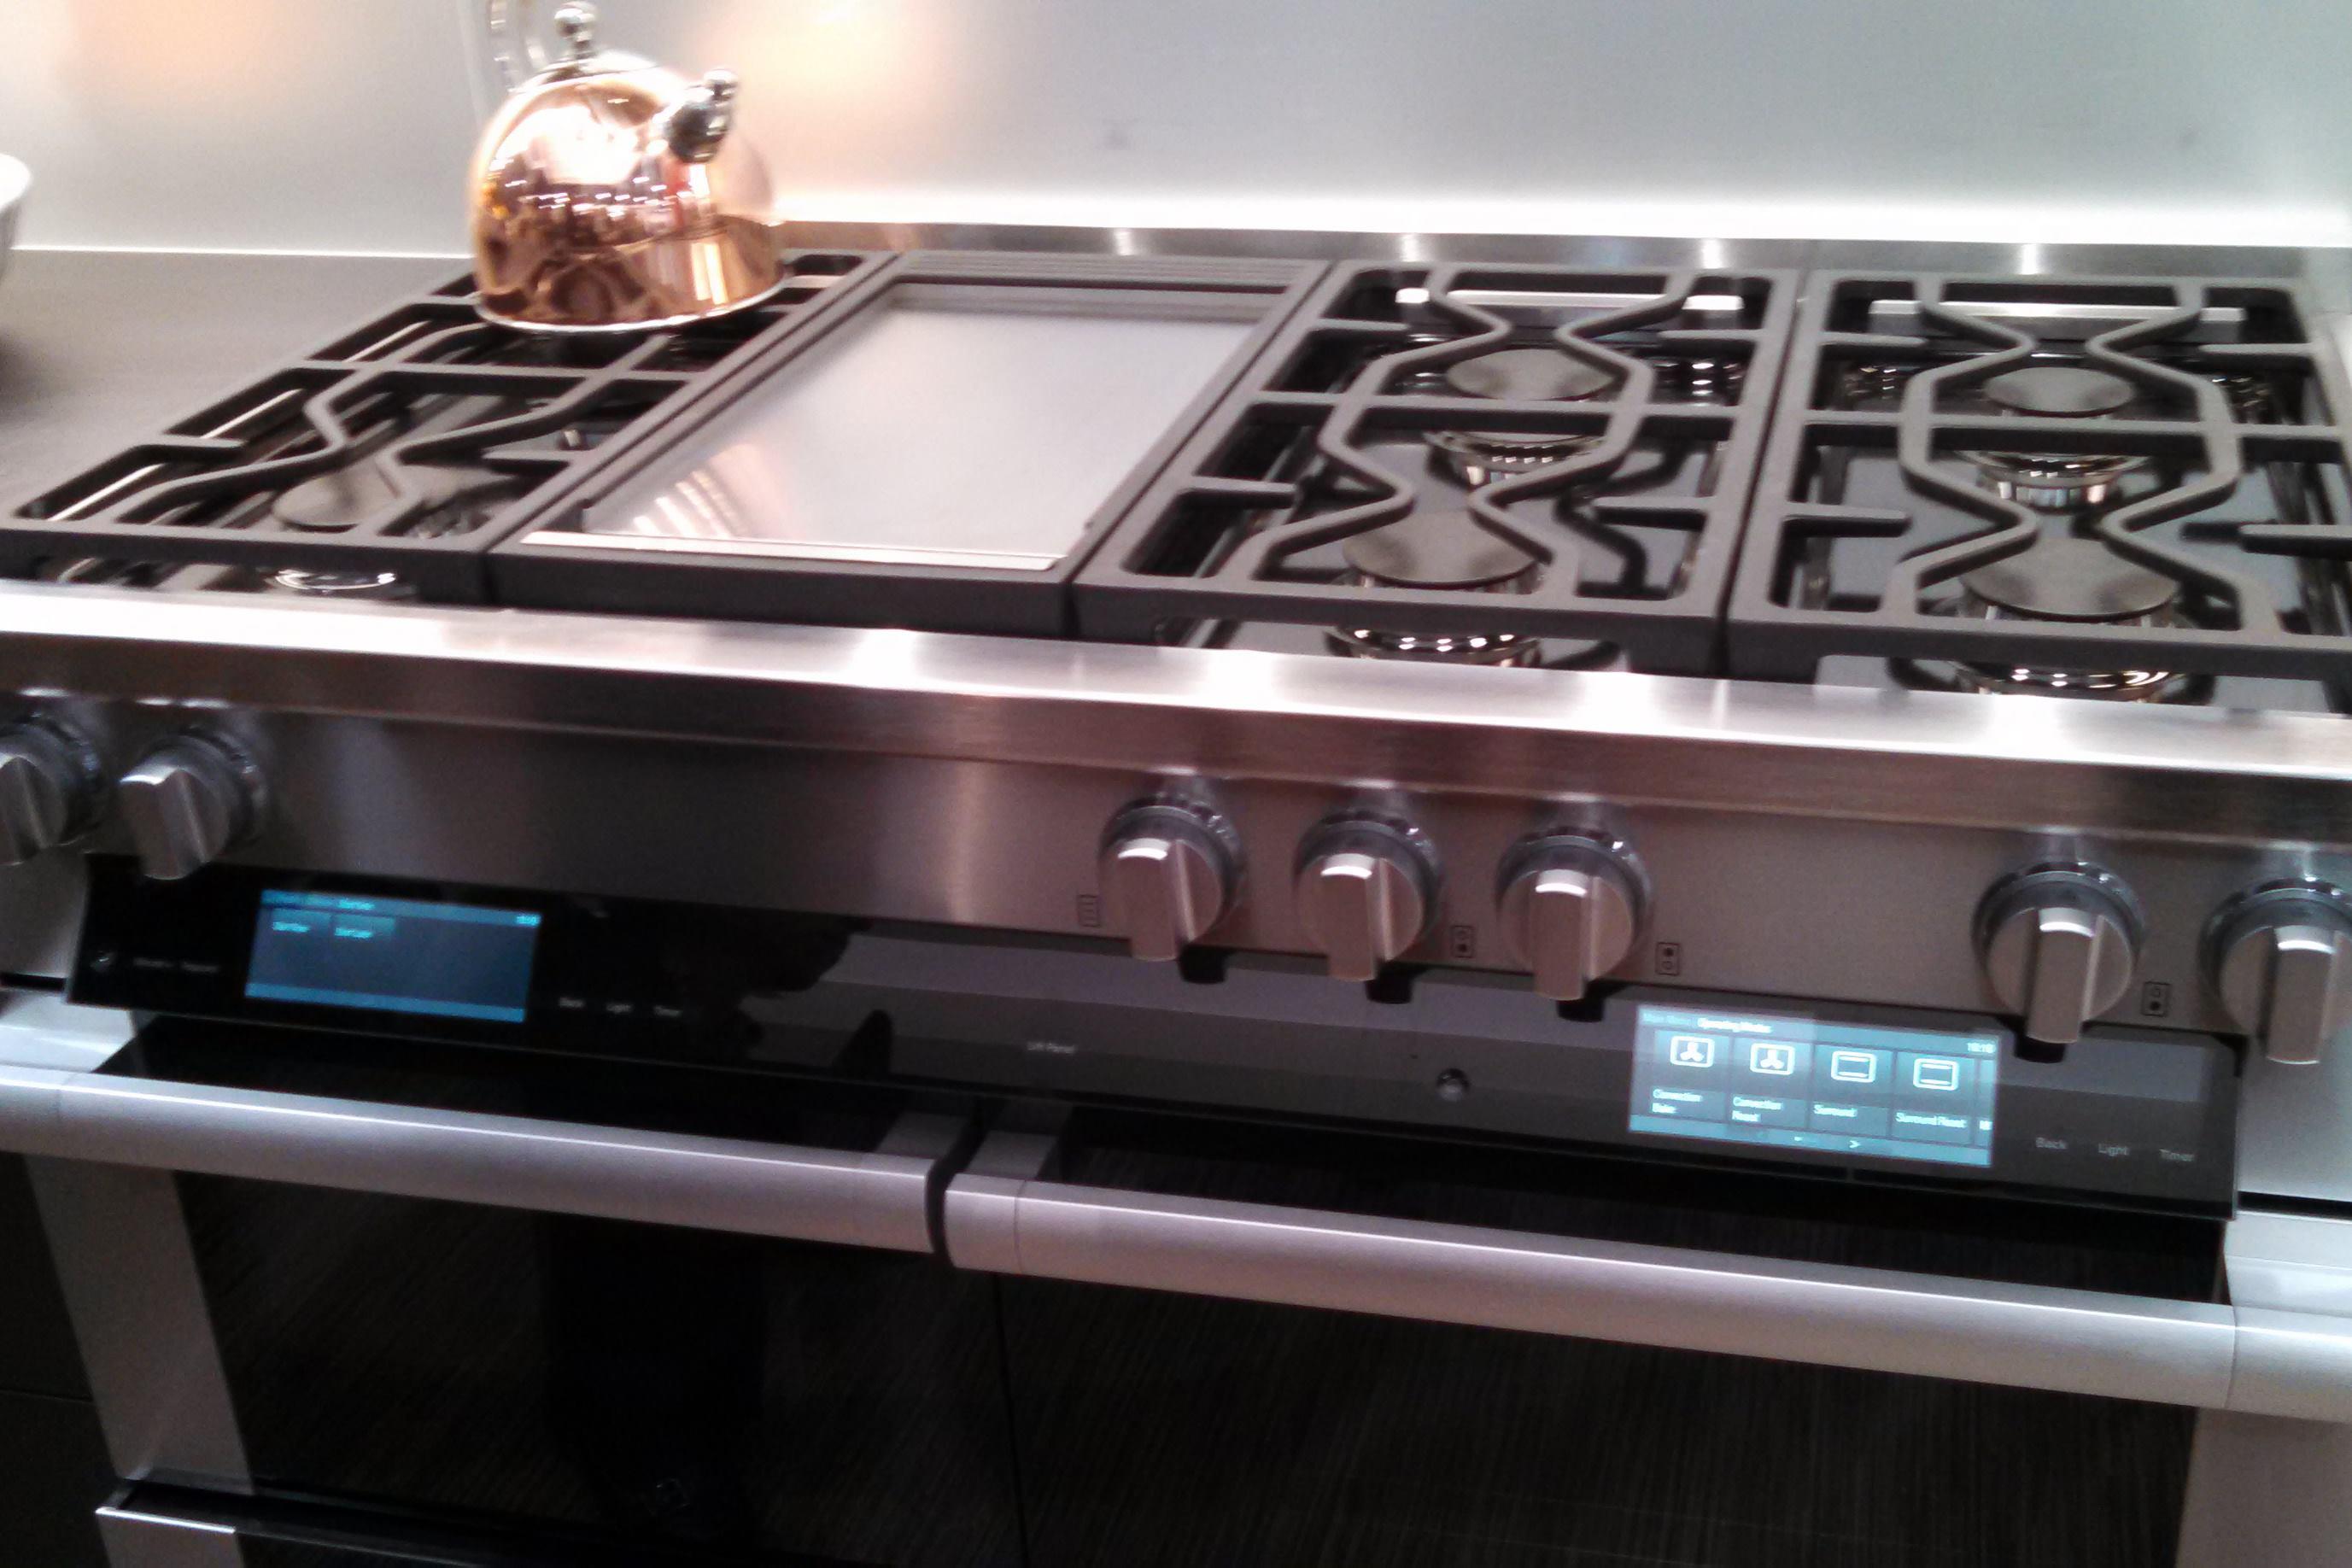 best high end kitchen appliances design books shine at kbis 2015 custom home